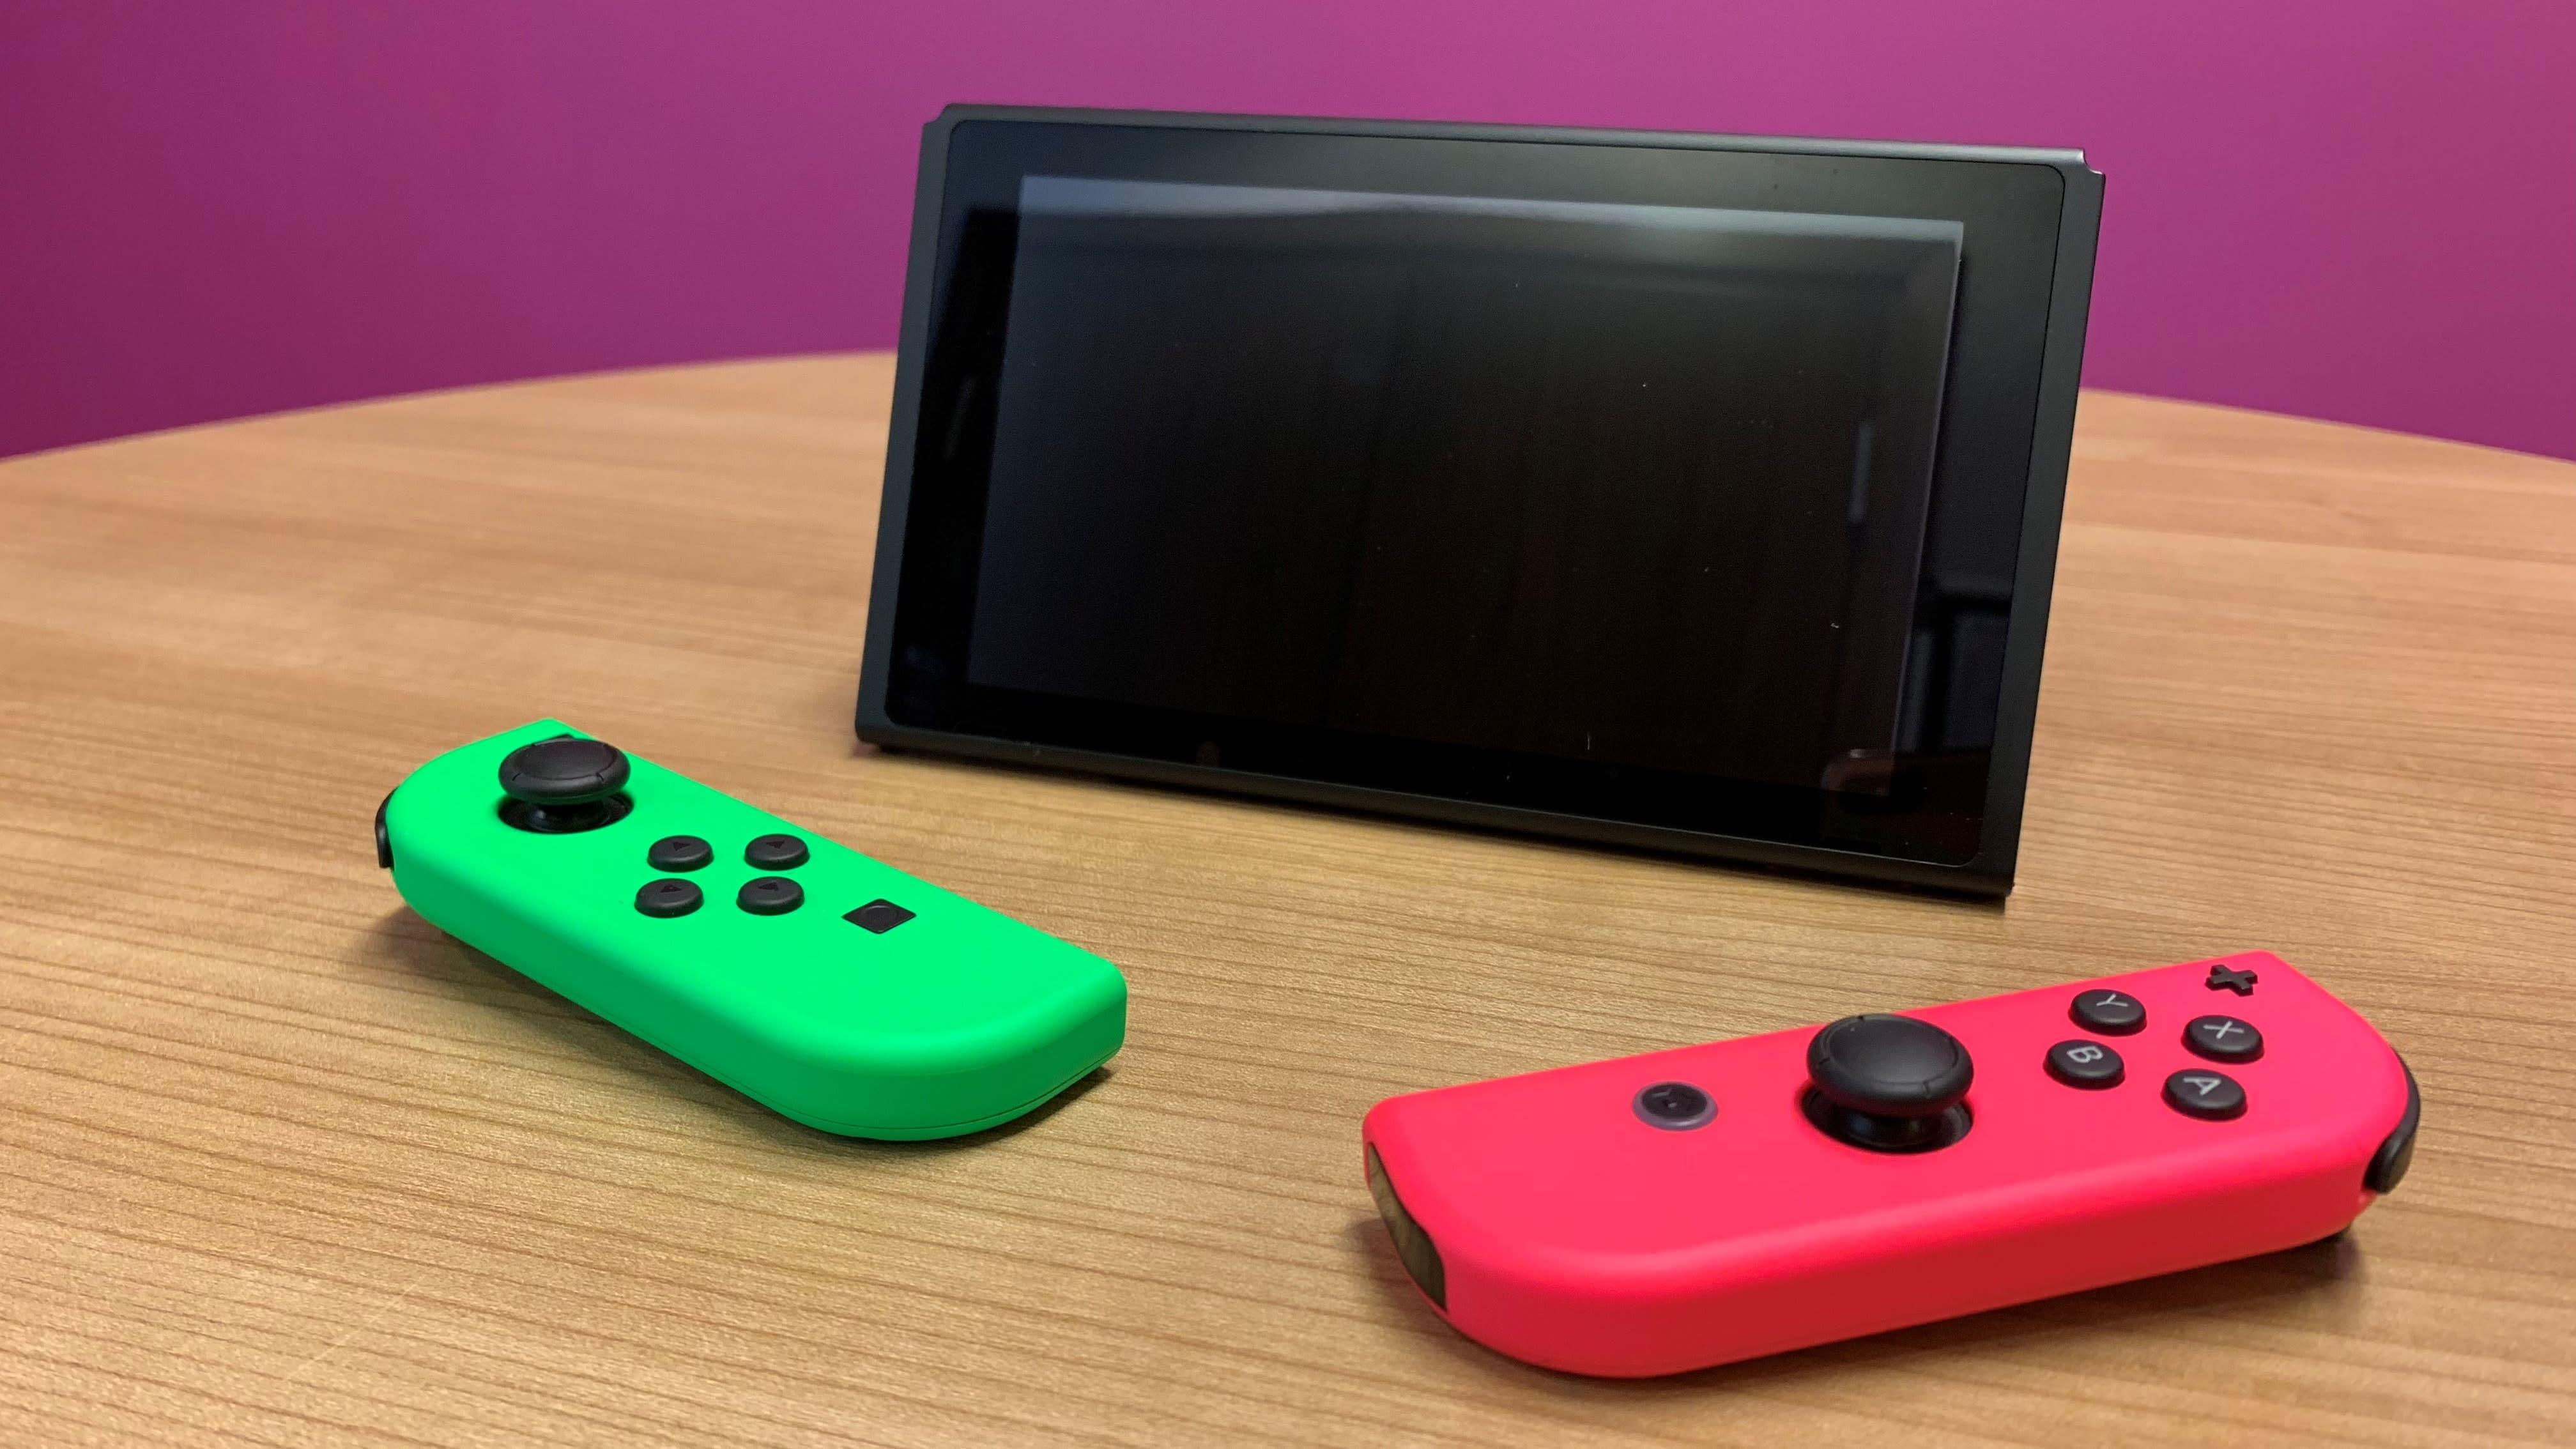 Nintendo Says Switch Console Shipments Delayed By Coronavirus